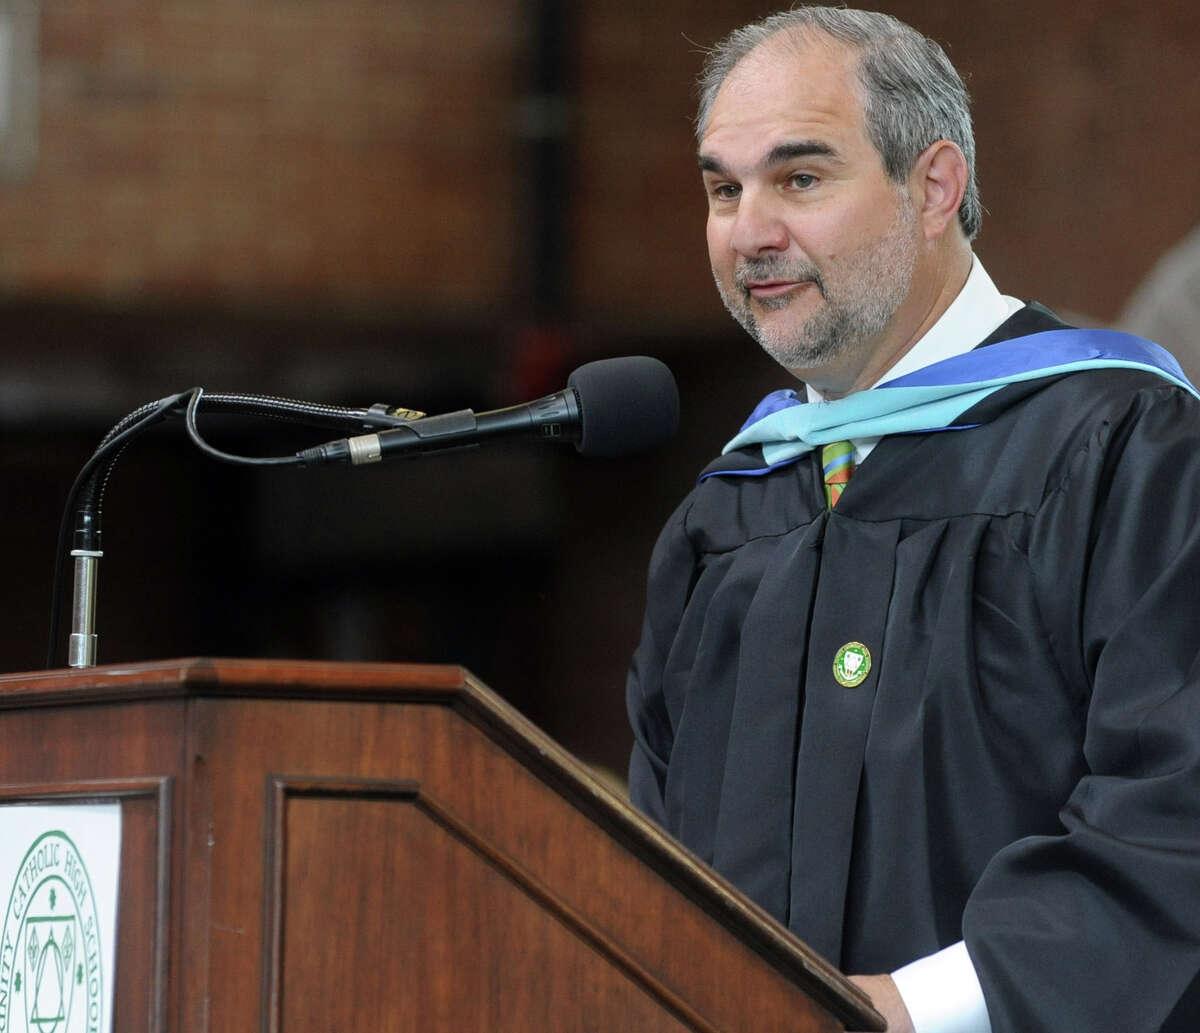 Principal Tony Pavia speaks during Saturday's graduation ceremony at Trinity Catholic High School in Stamford on June 9, 2012.